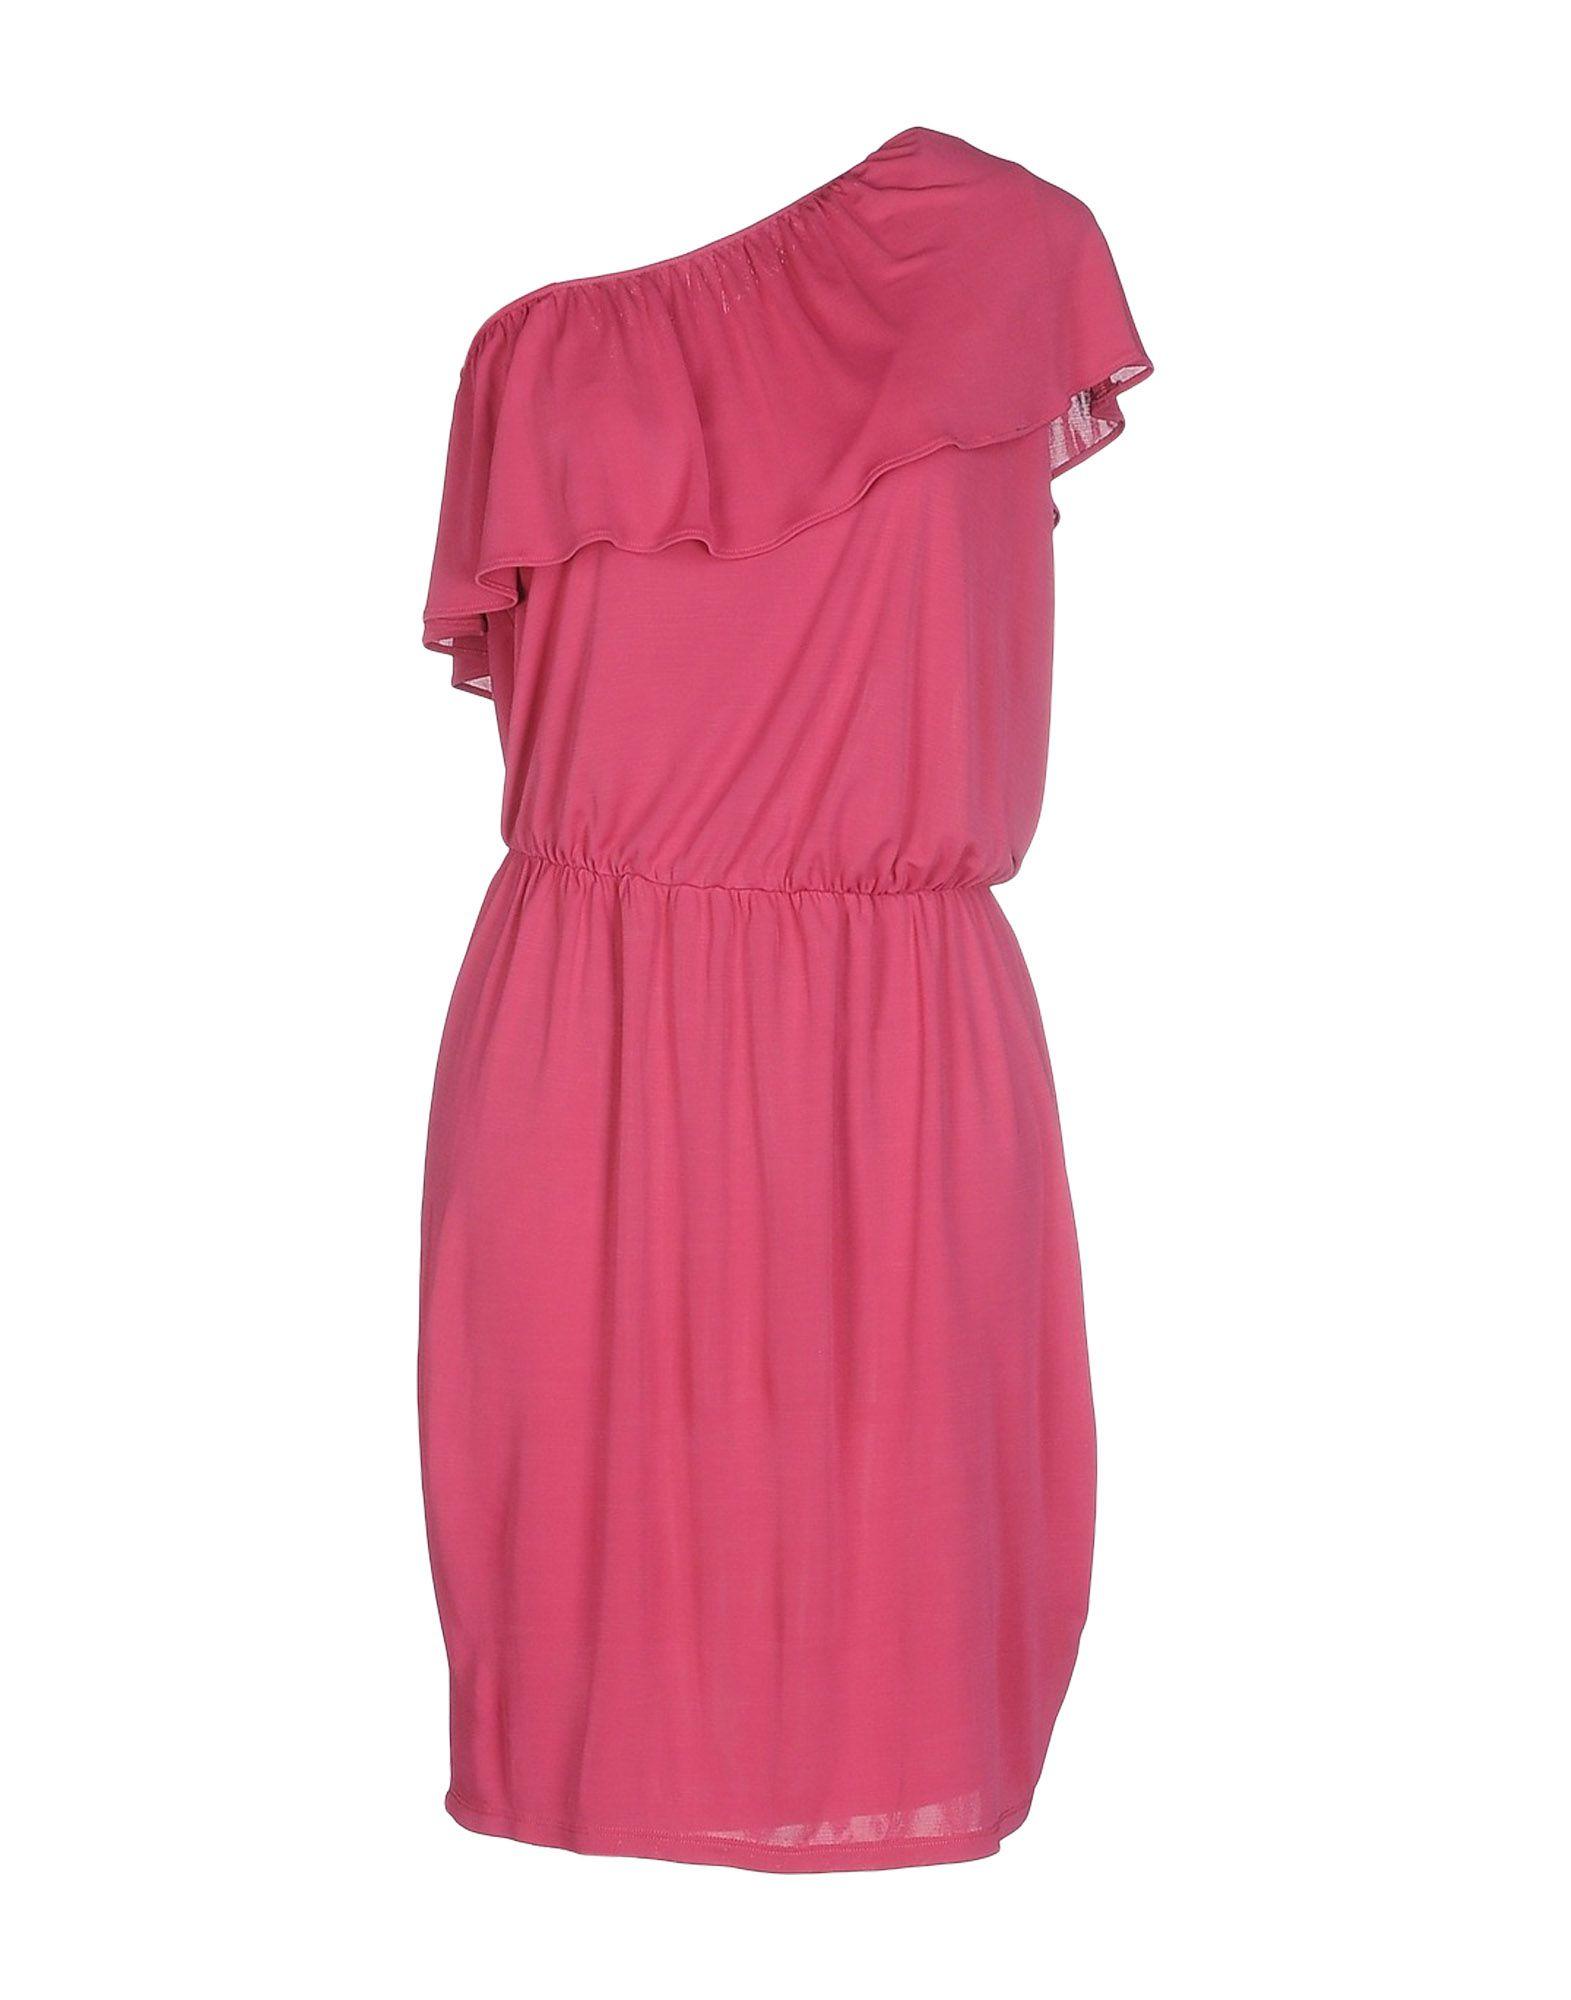 LIU •JO JEANS Короткое платье liu •jo jeans короткое платье